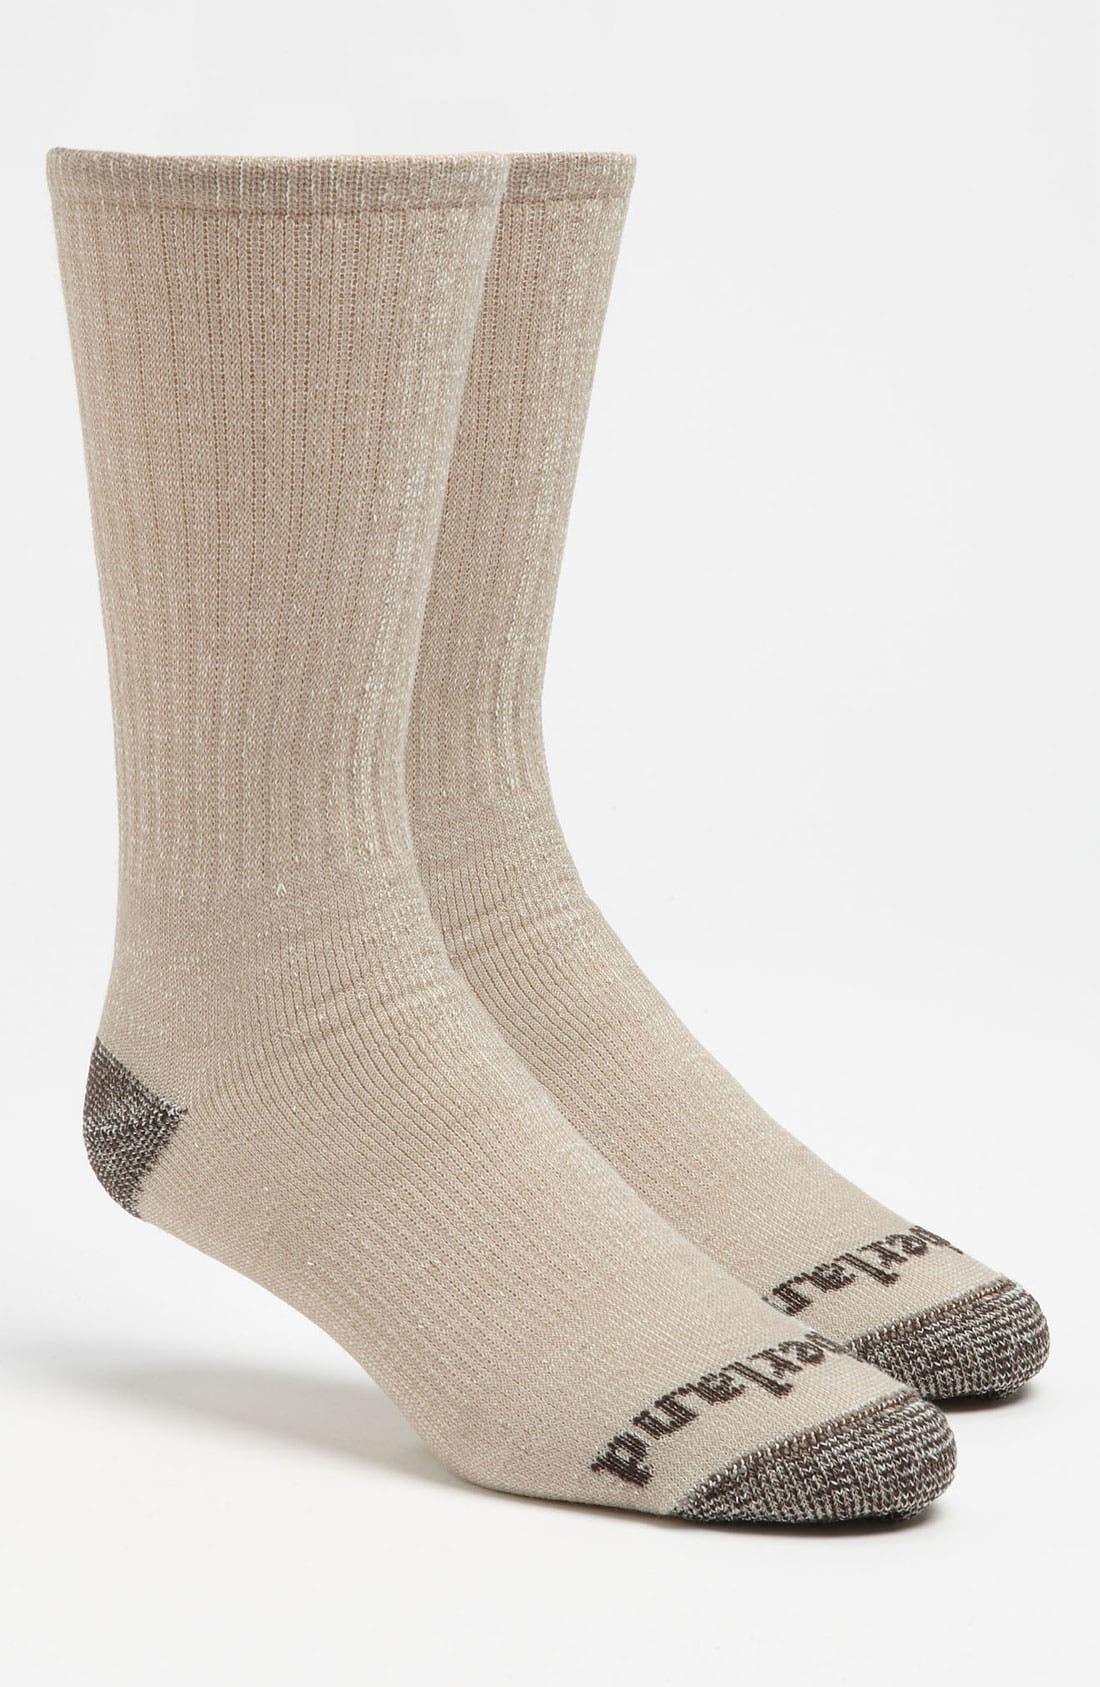 Alternate Image 1 Selected - Timberland Lightweight Merino Wool Blend Crew Socks (2-Pack)